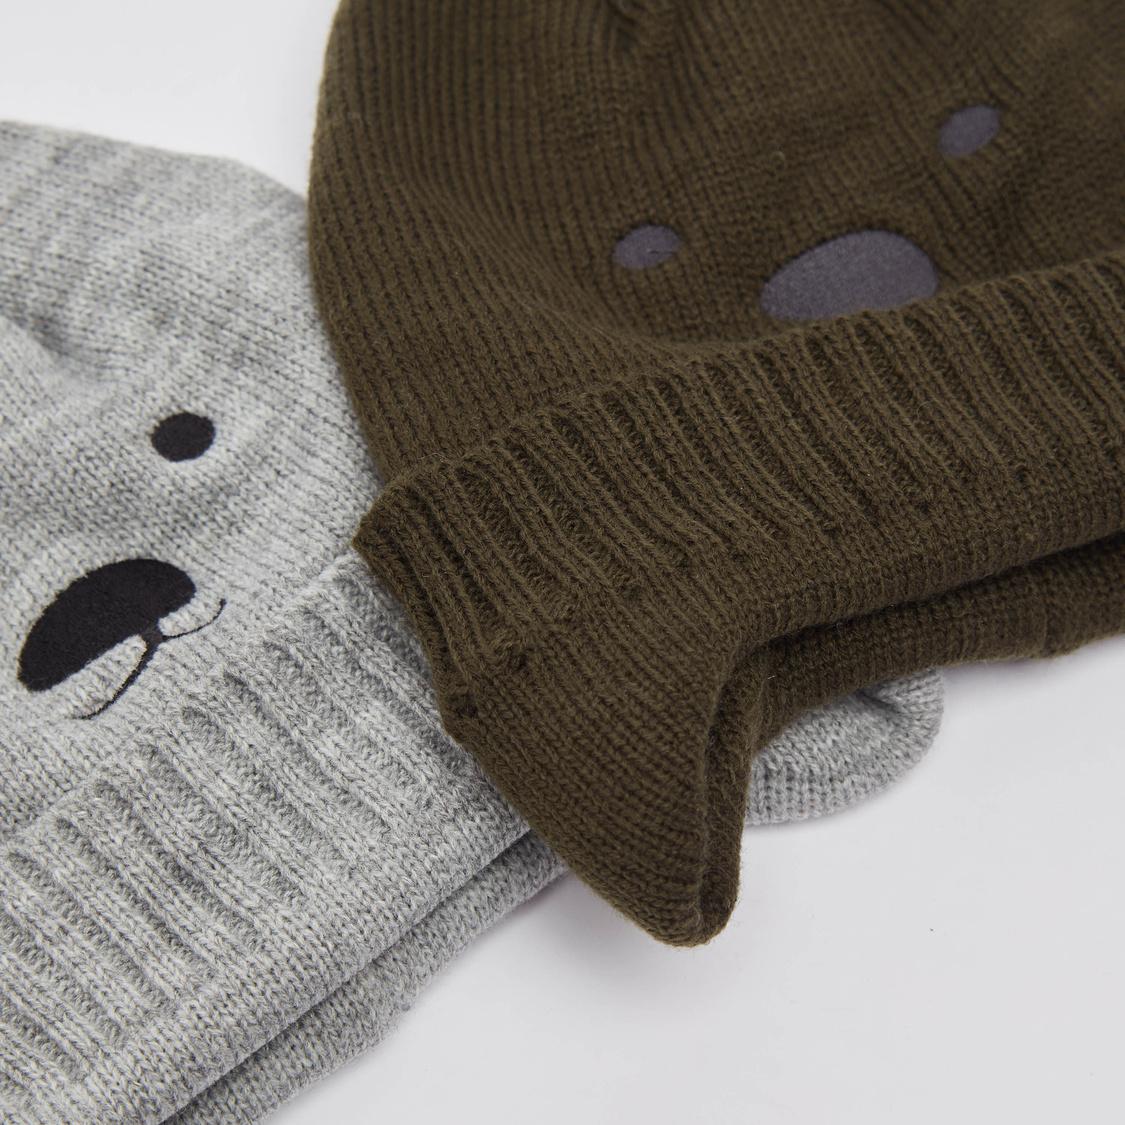 Set of 2 - Textured Beanie Cap with Cuffed Hem and Pom-Pom Detail